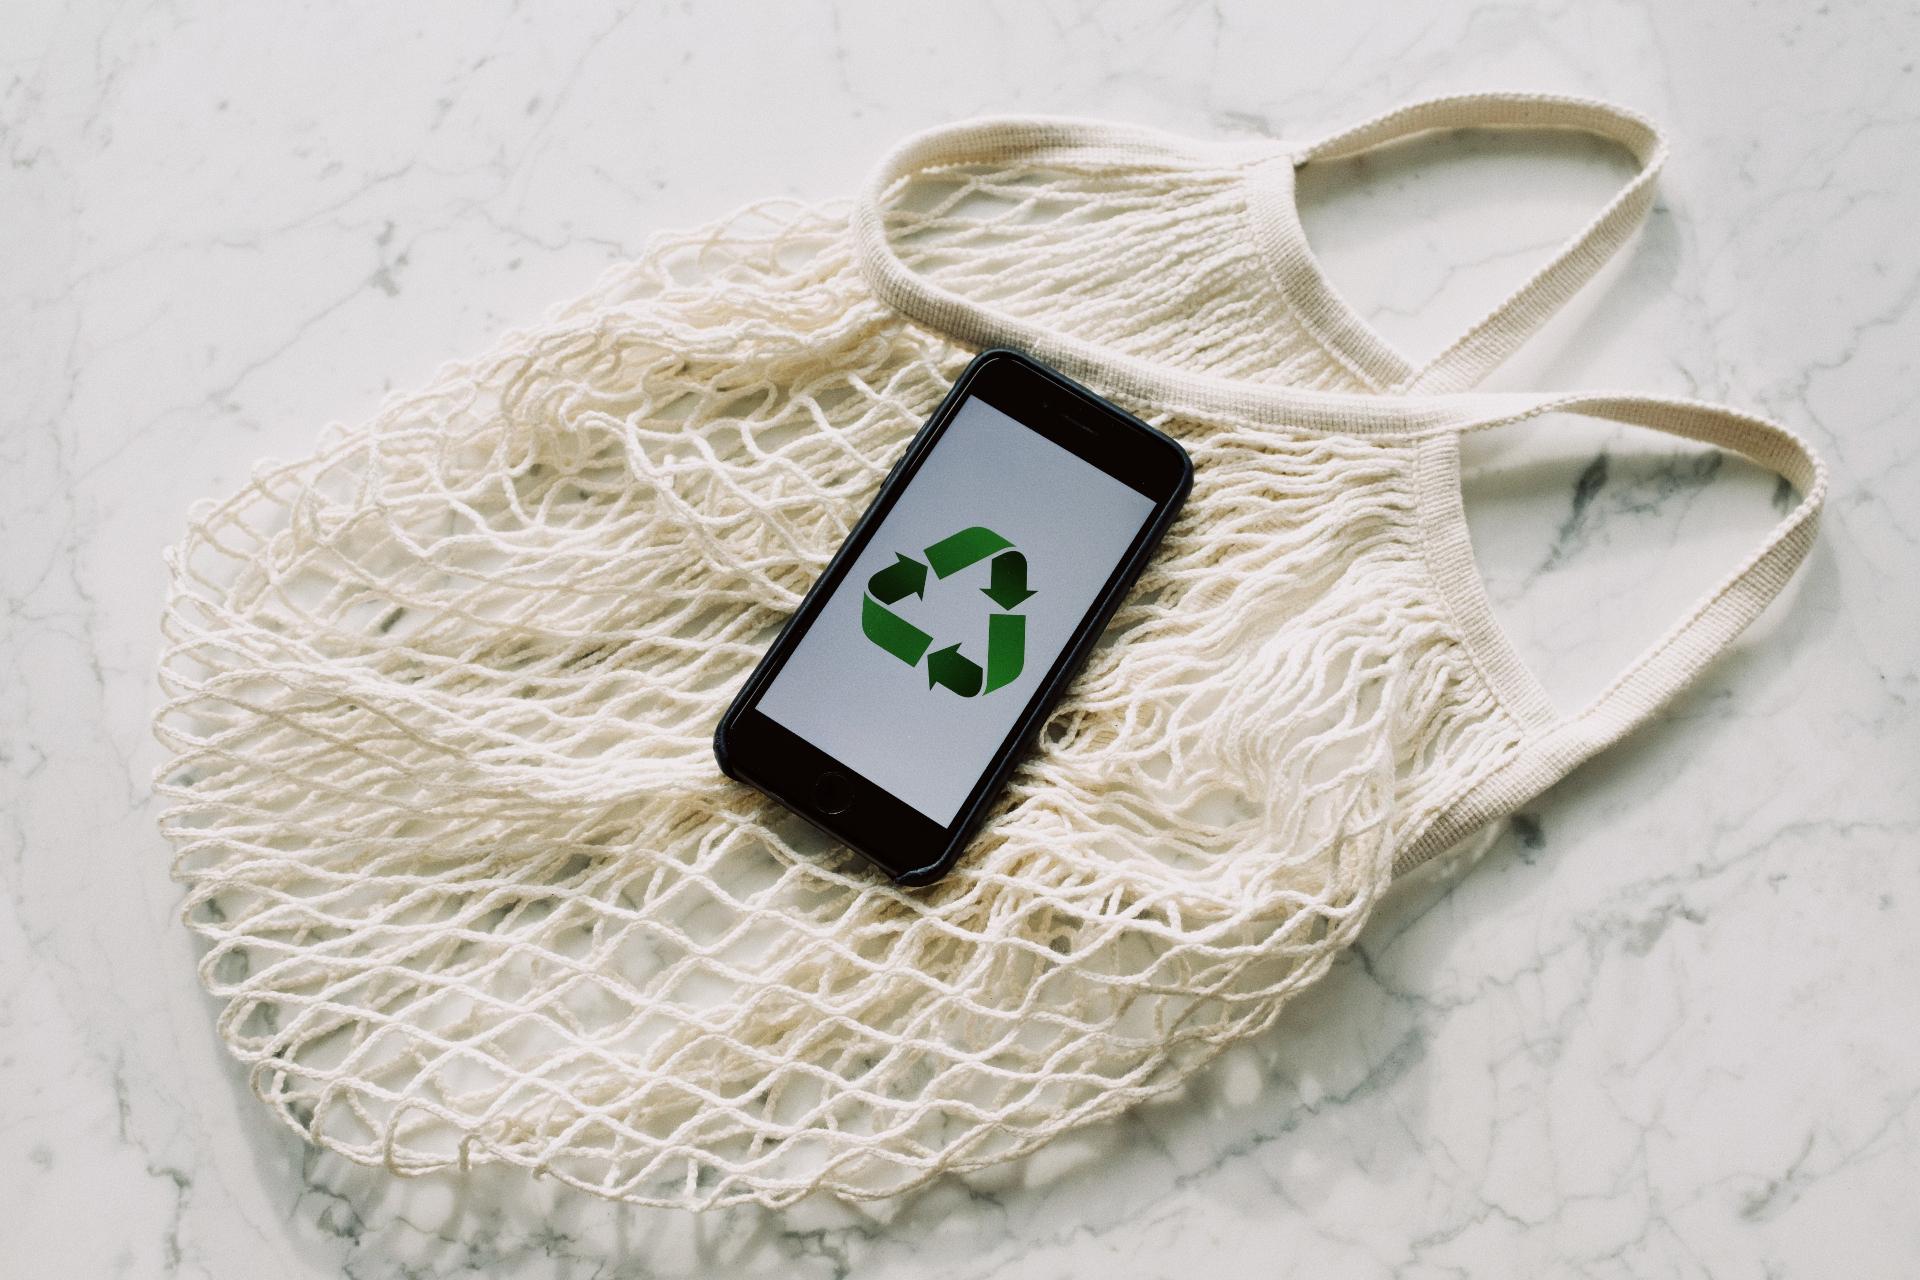 dan zaštite okoliša